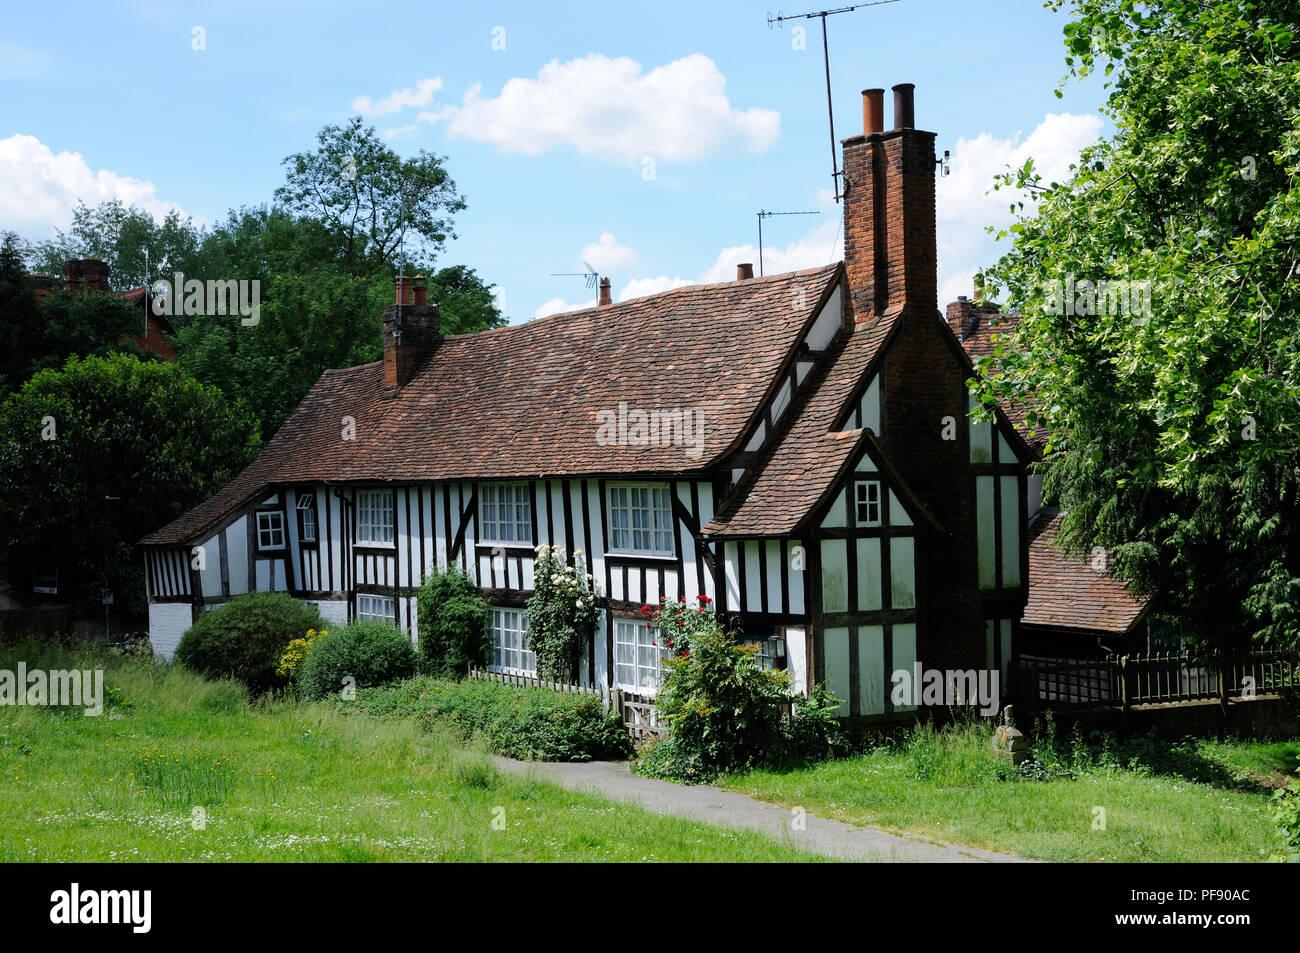 dating Hatfield Hertfordshire